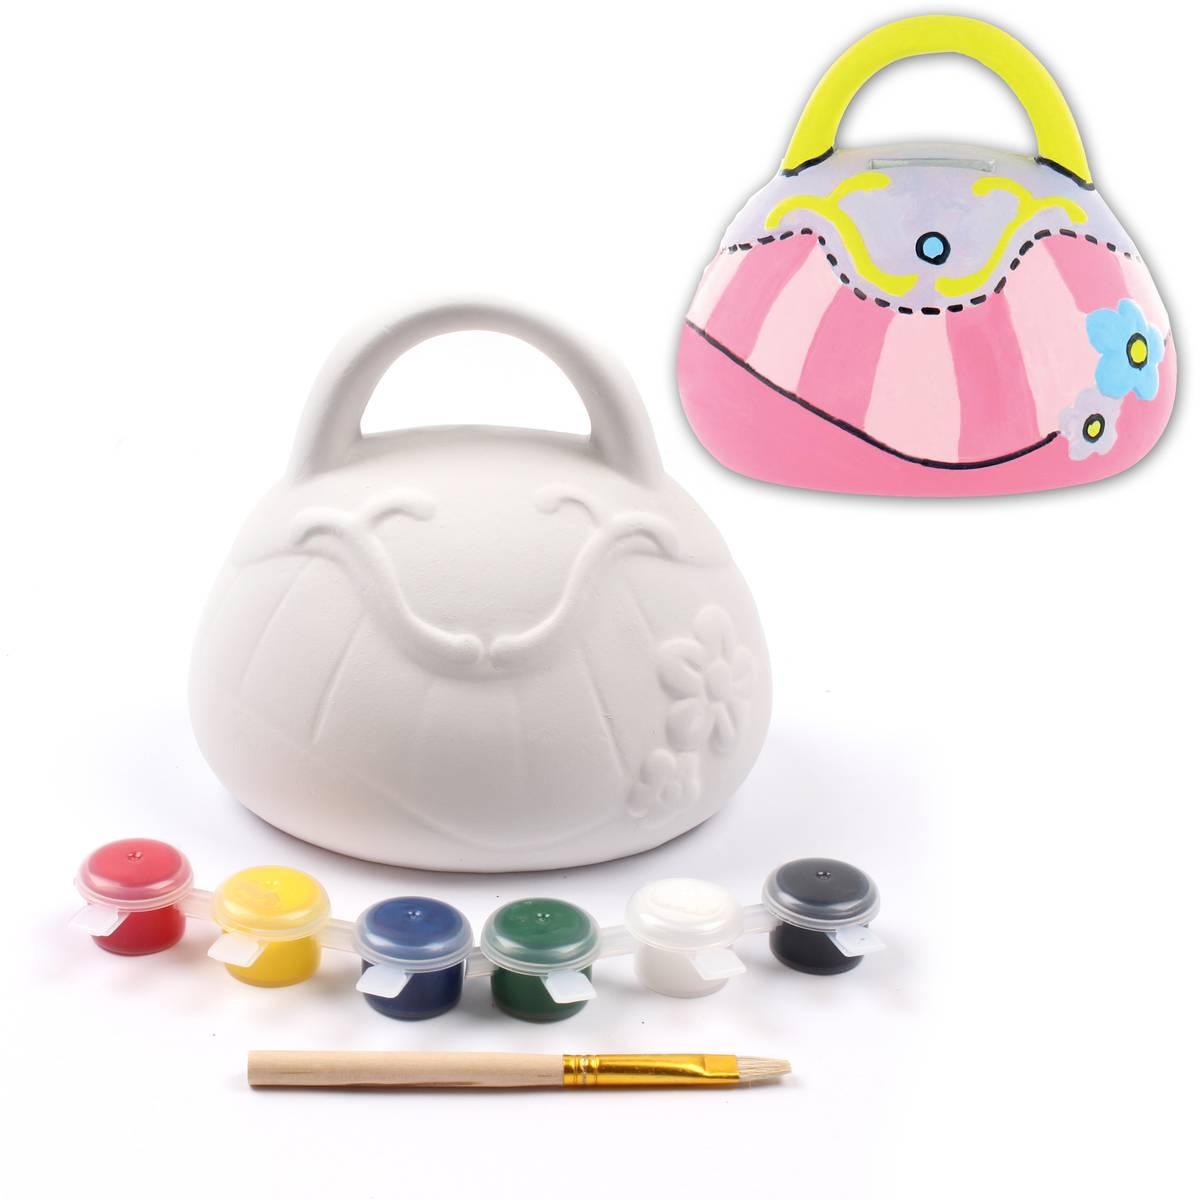 Hobbycraft Paint Your Own Handbag Money Box was £3.50 now £1.75.